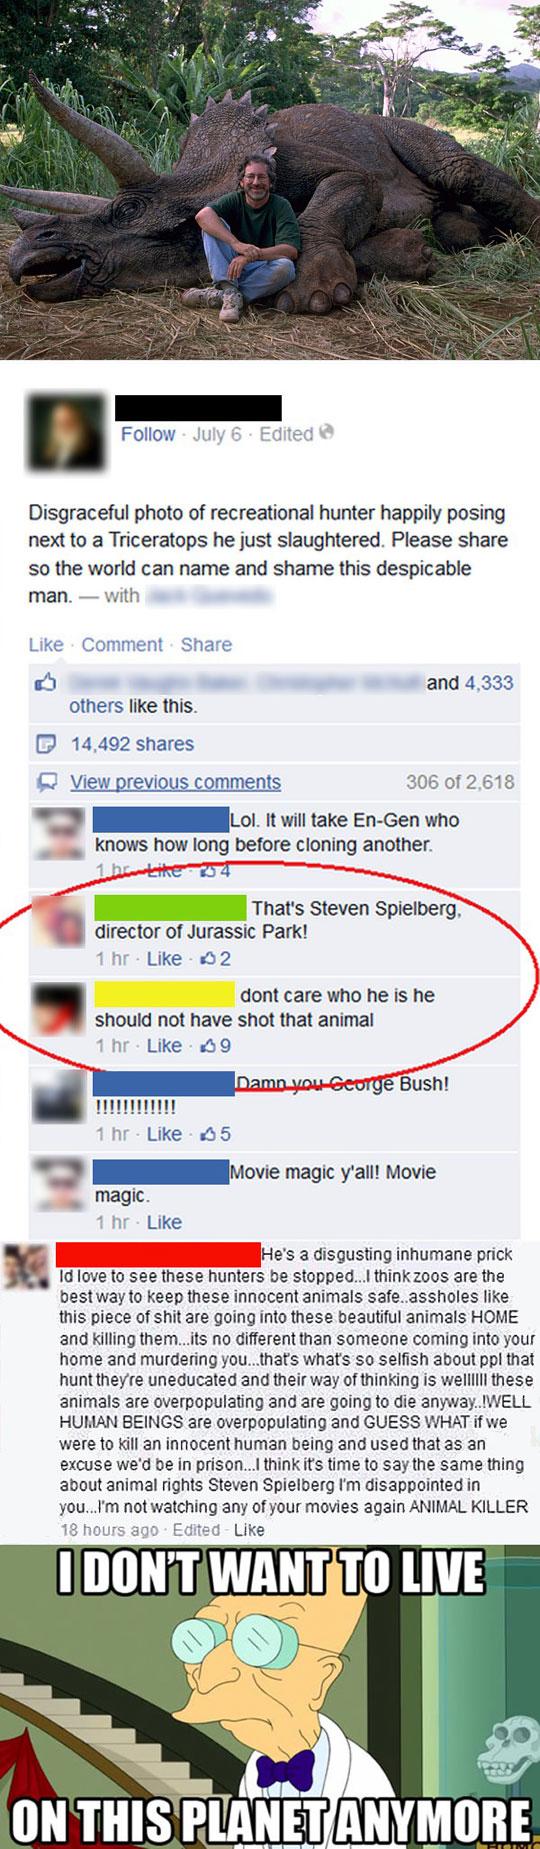 Steven Spielberg Has No Shame